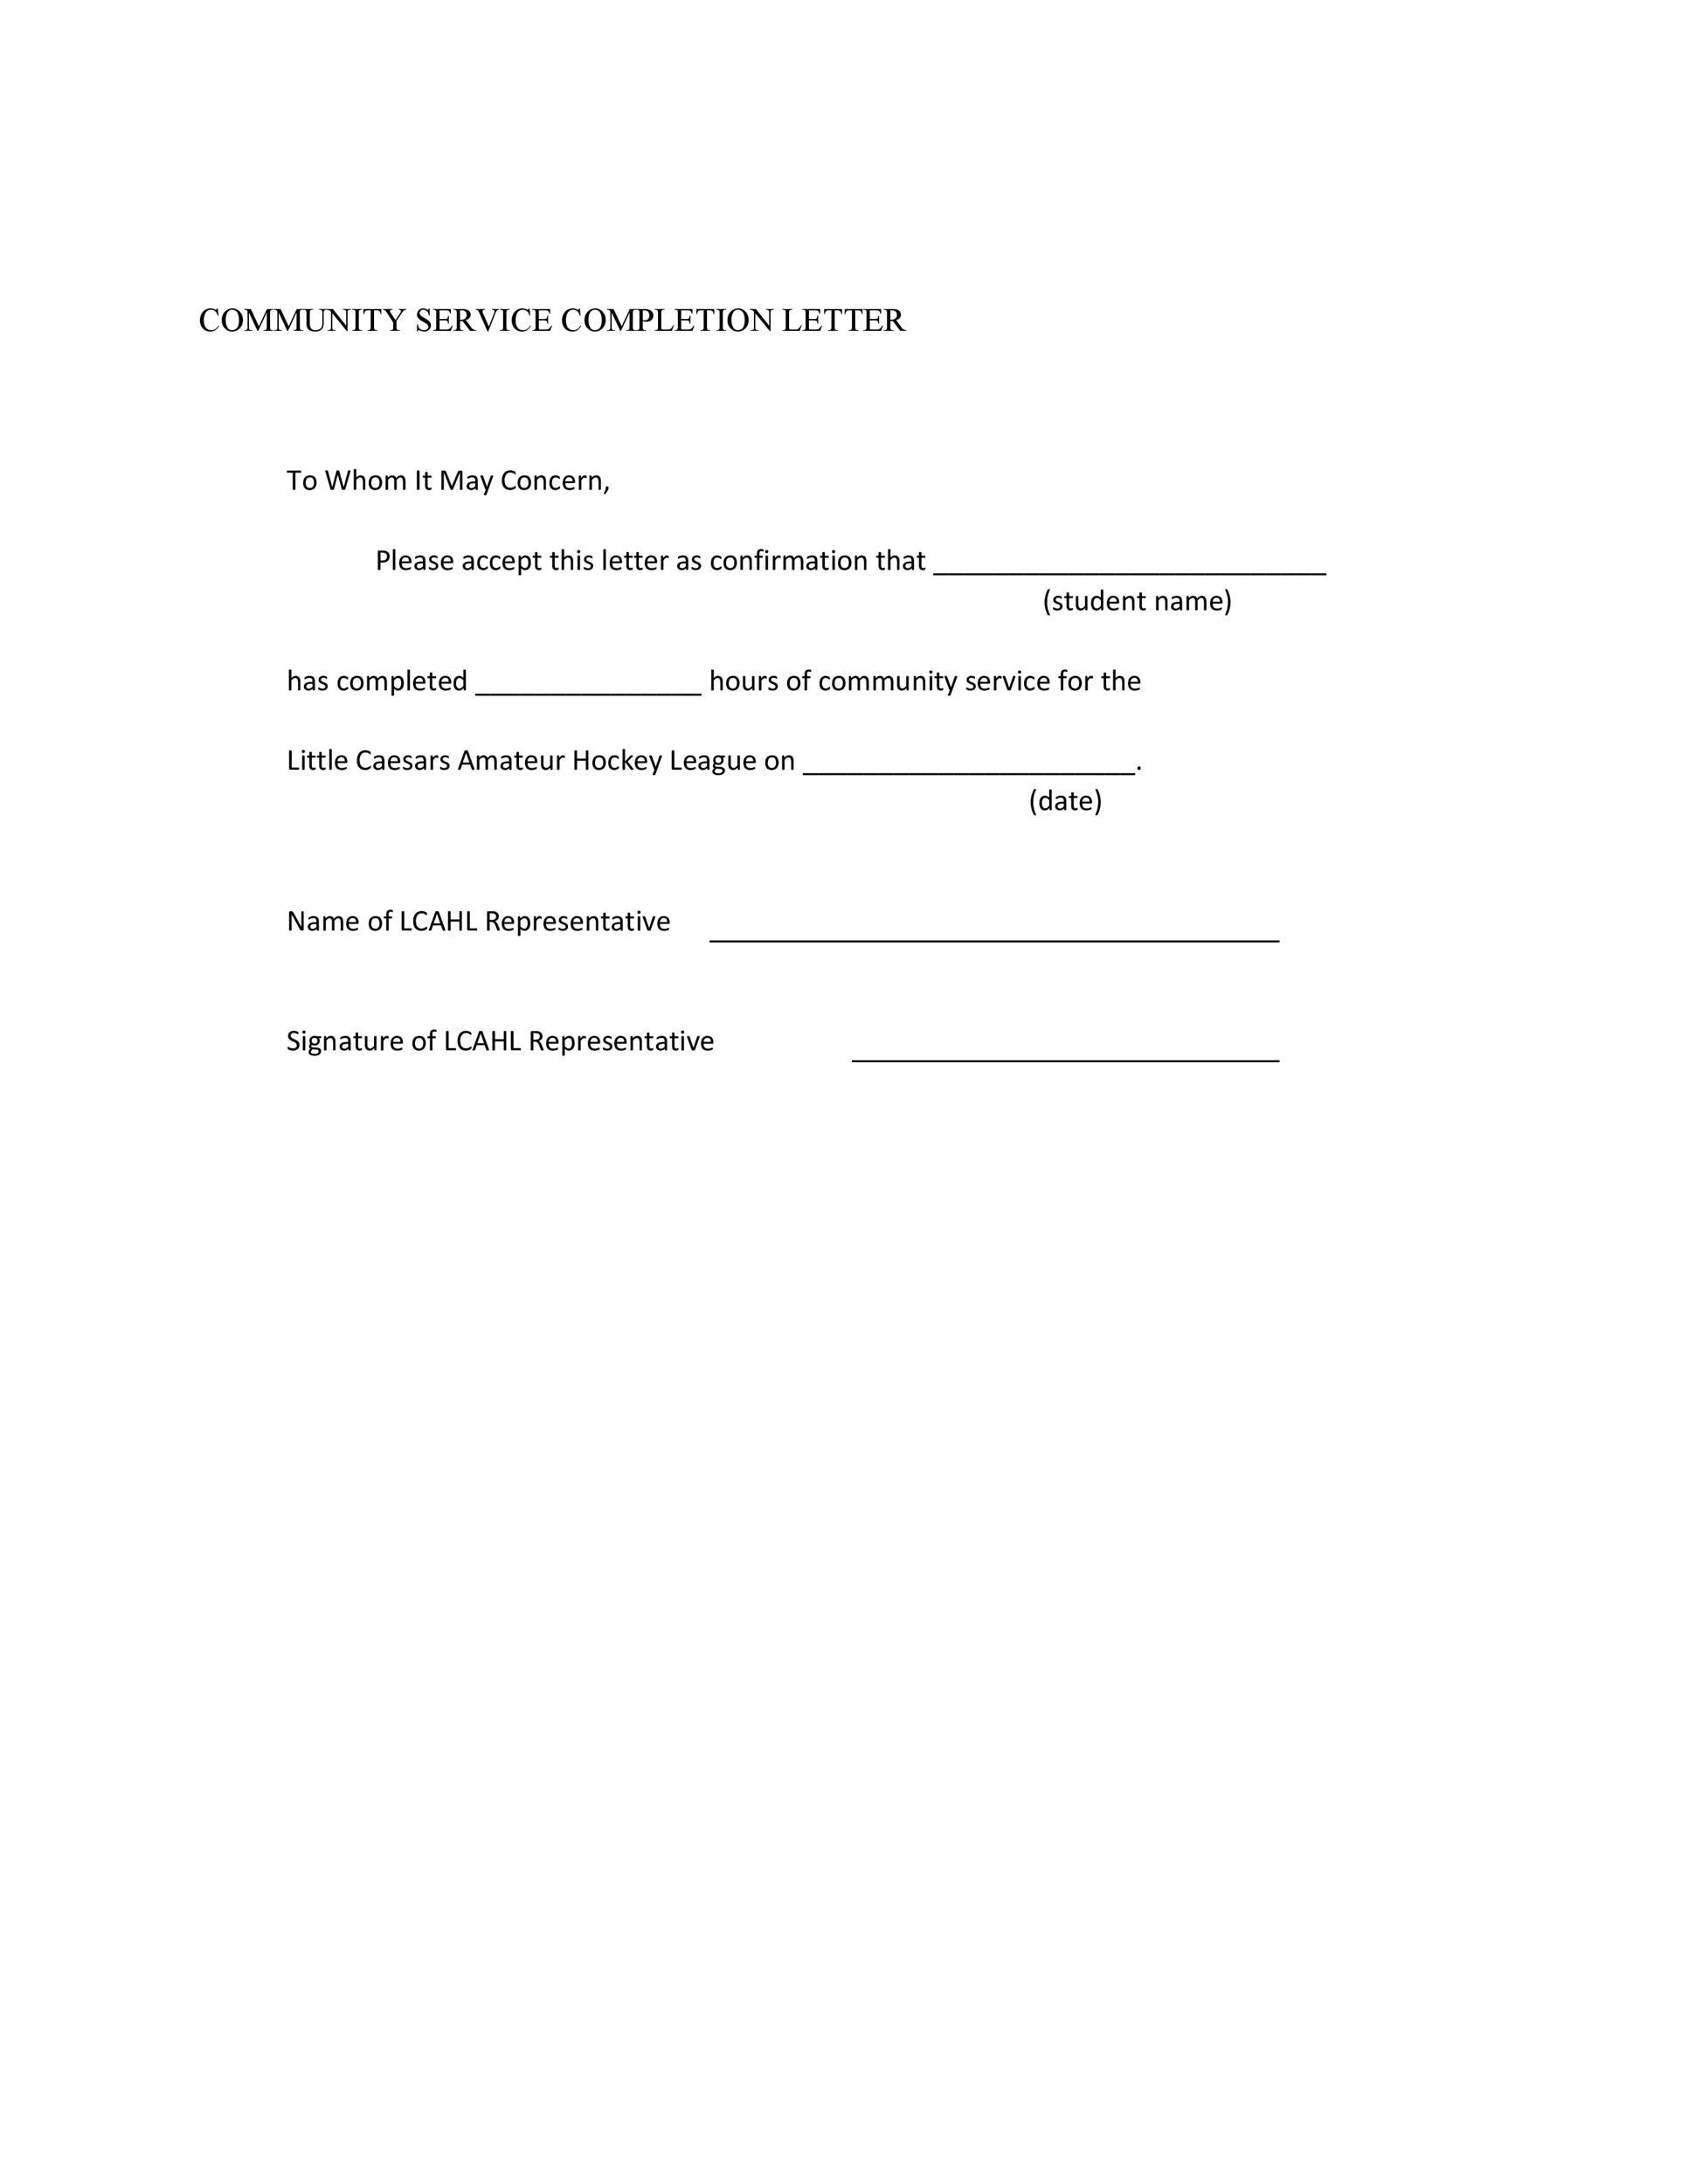 Community Service Letter - 40+ Templates Completion, Verification